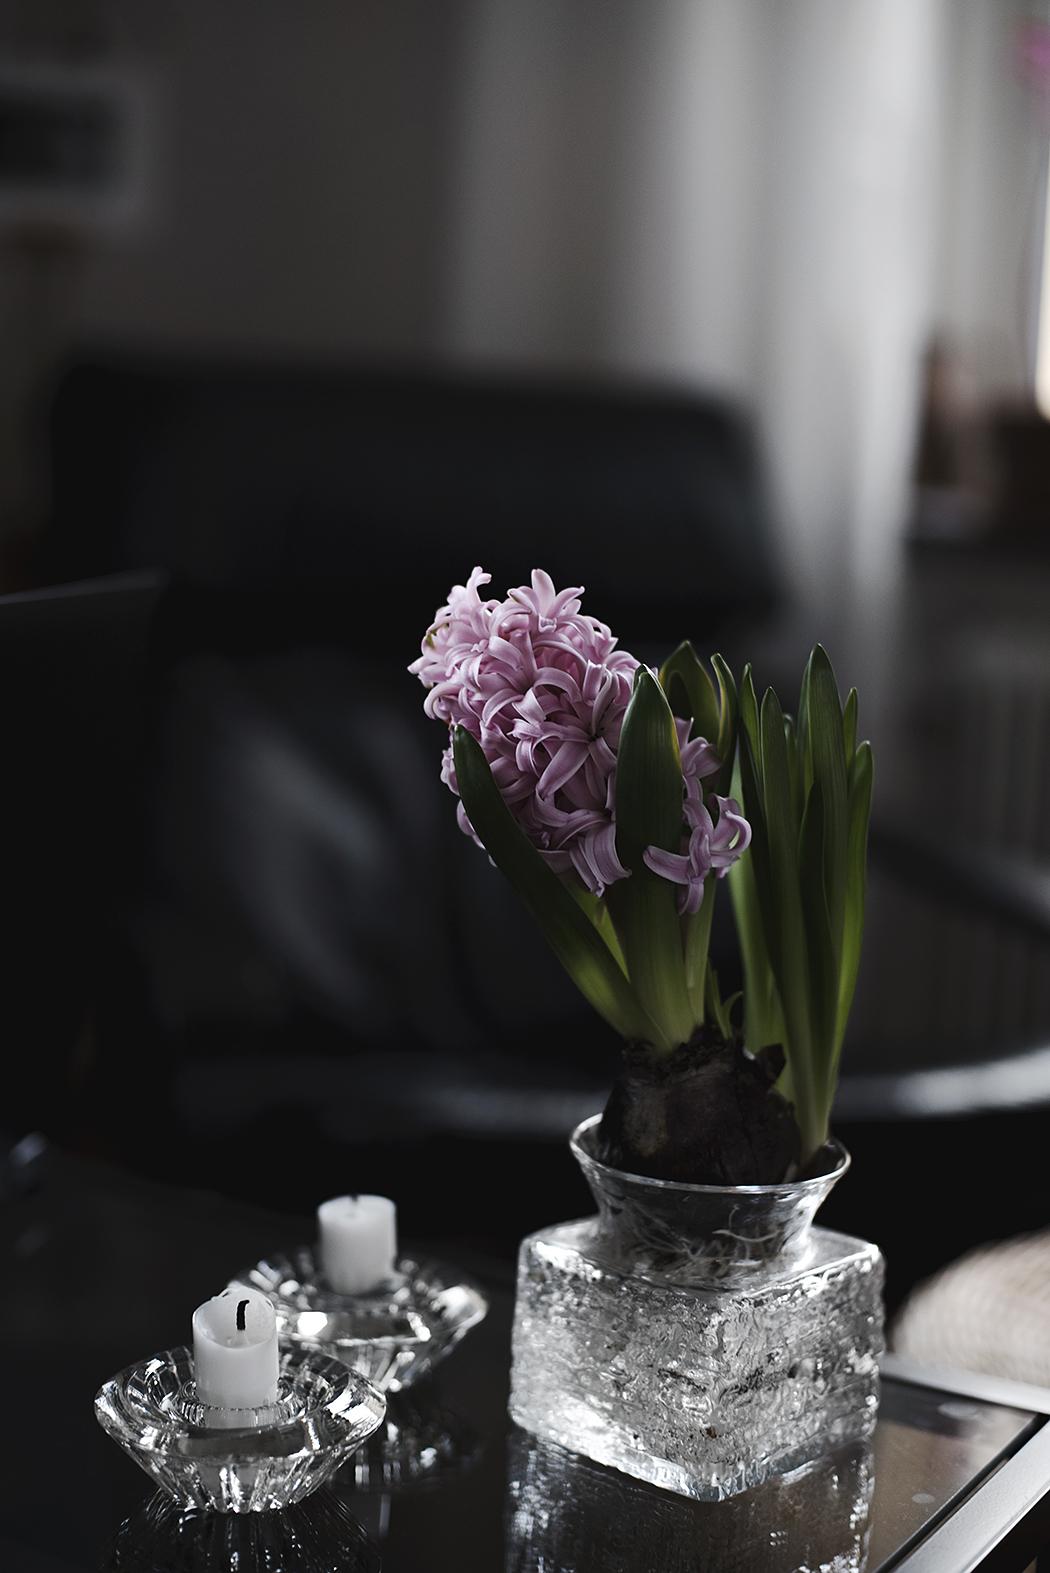 secondhand – ljusstakar i glas